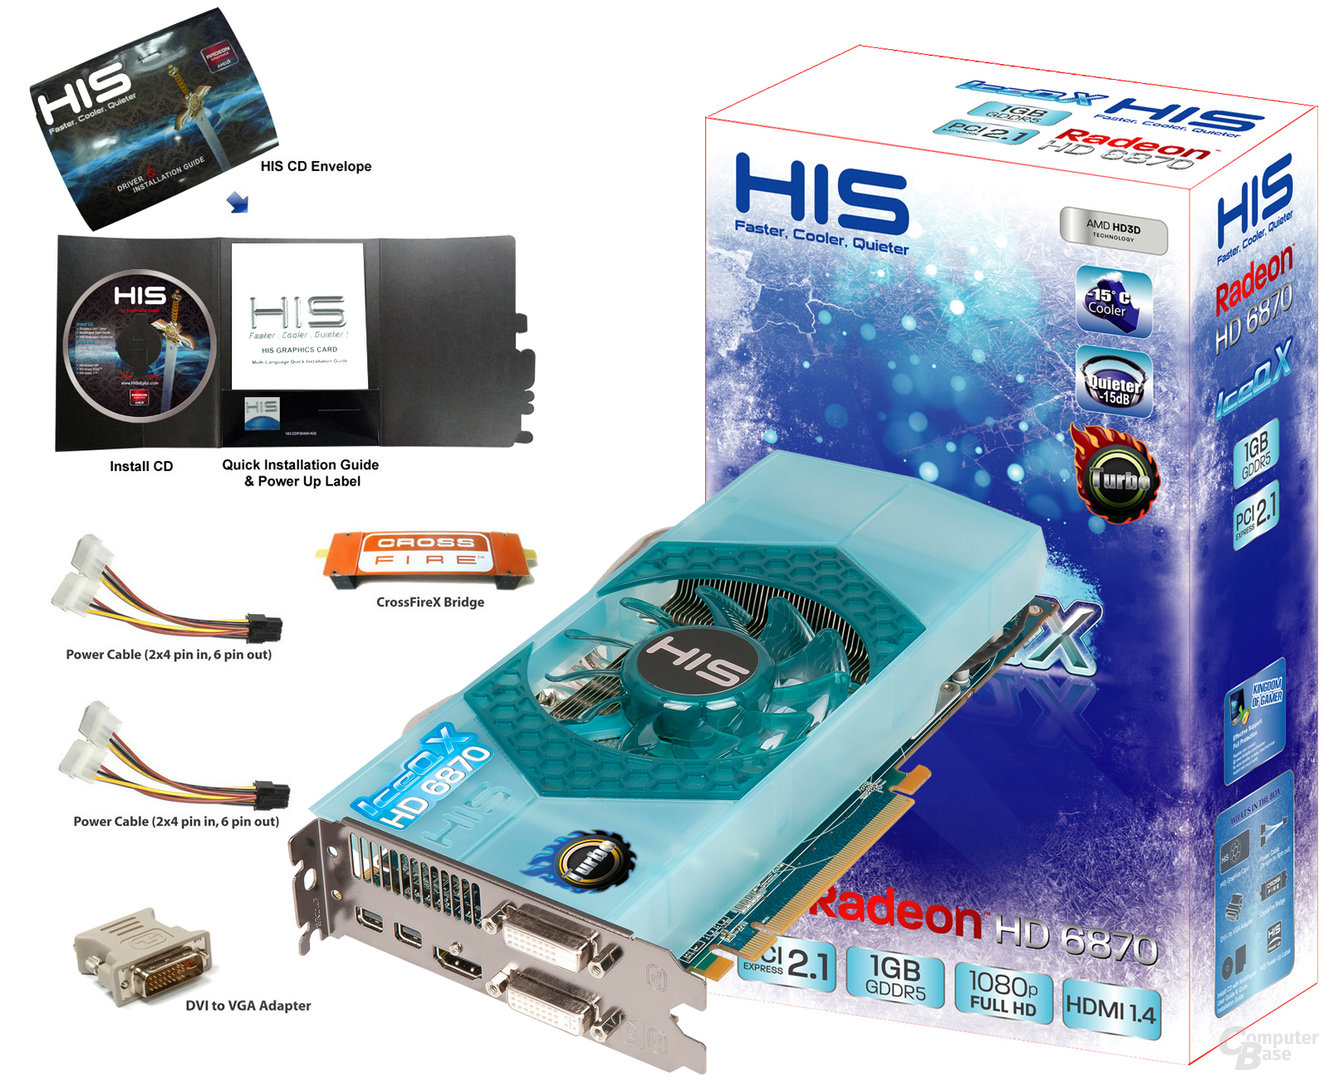 HIS Radeon HD 6870 IceQ X (Turbo)